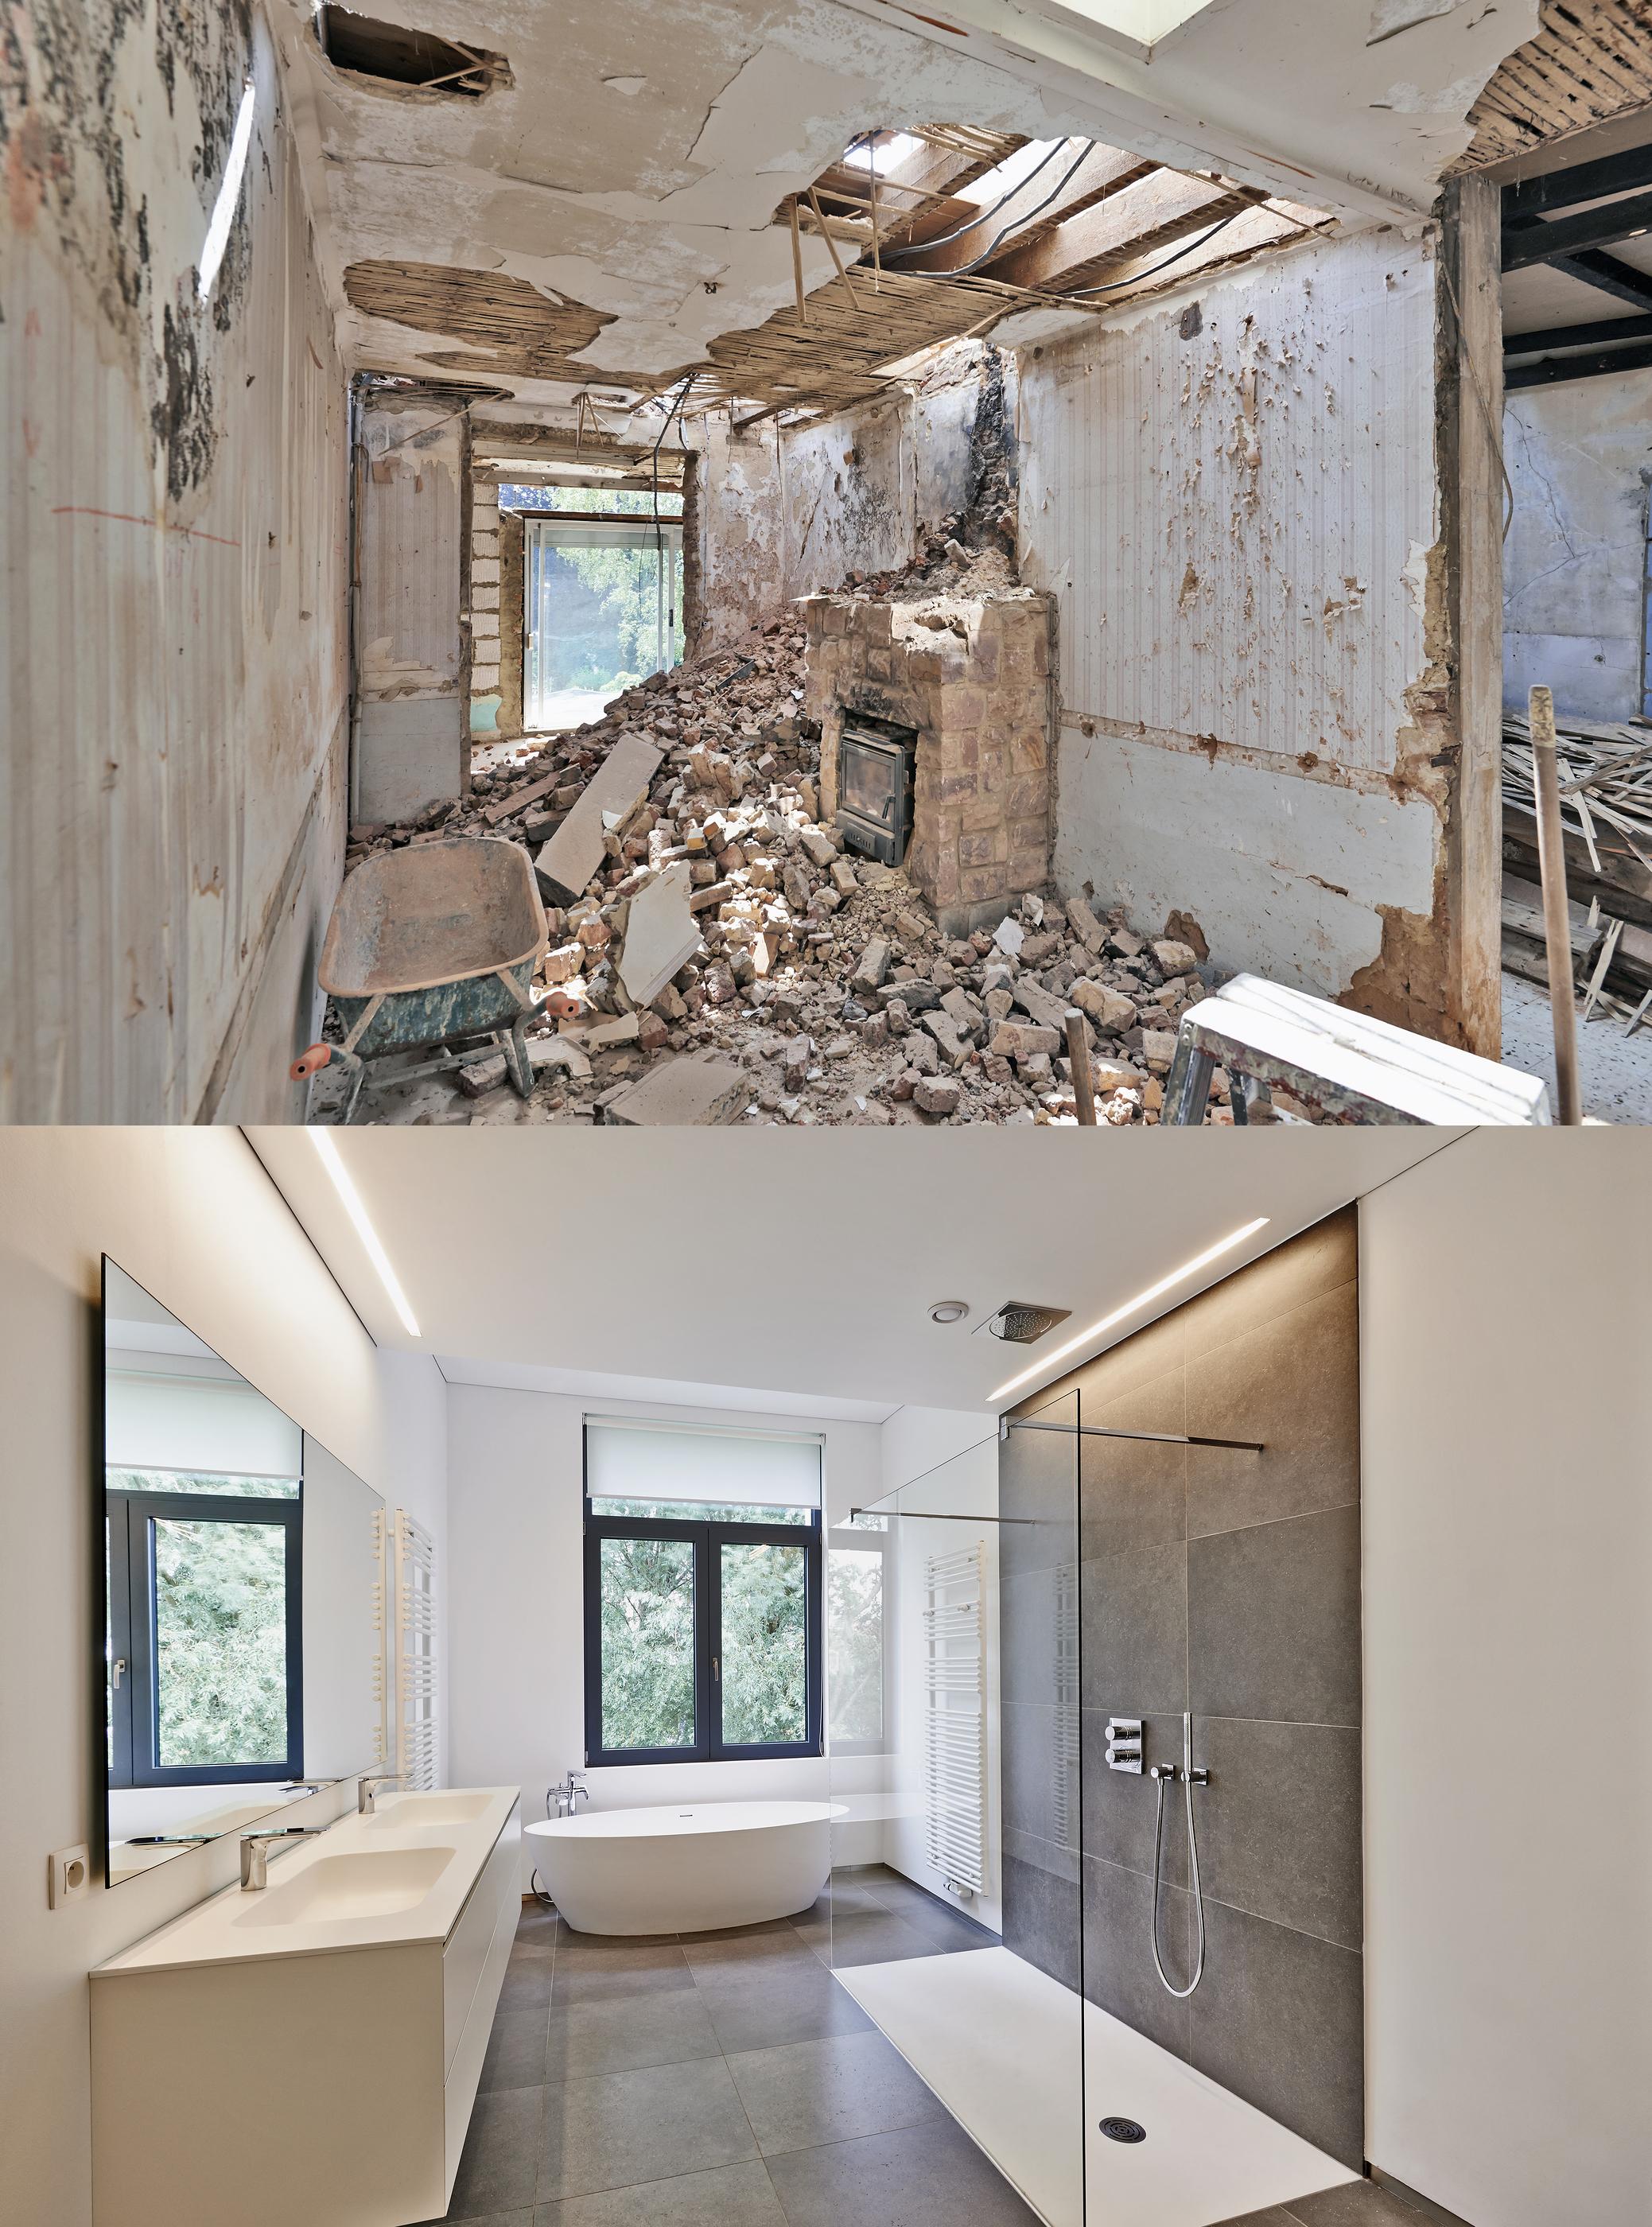 Renovation Of A Bathroom